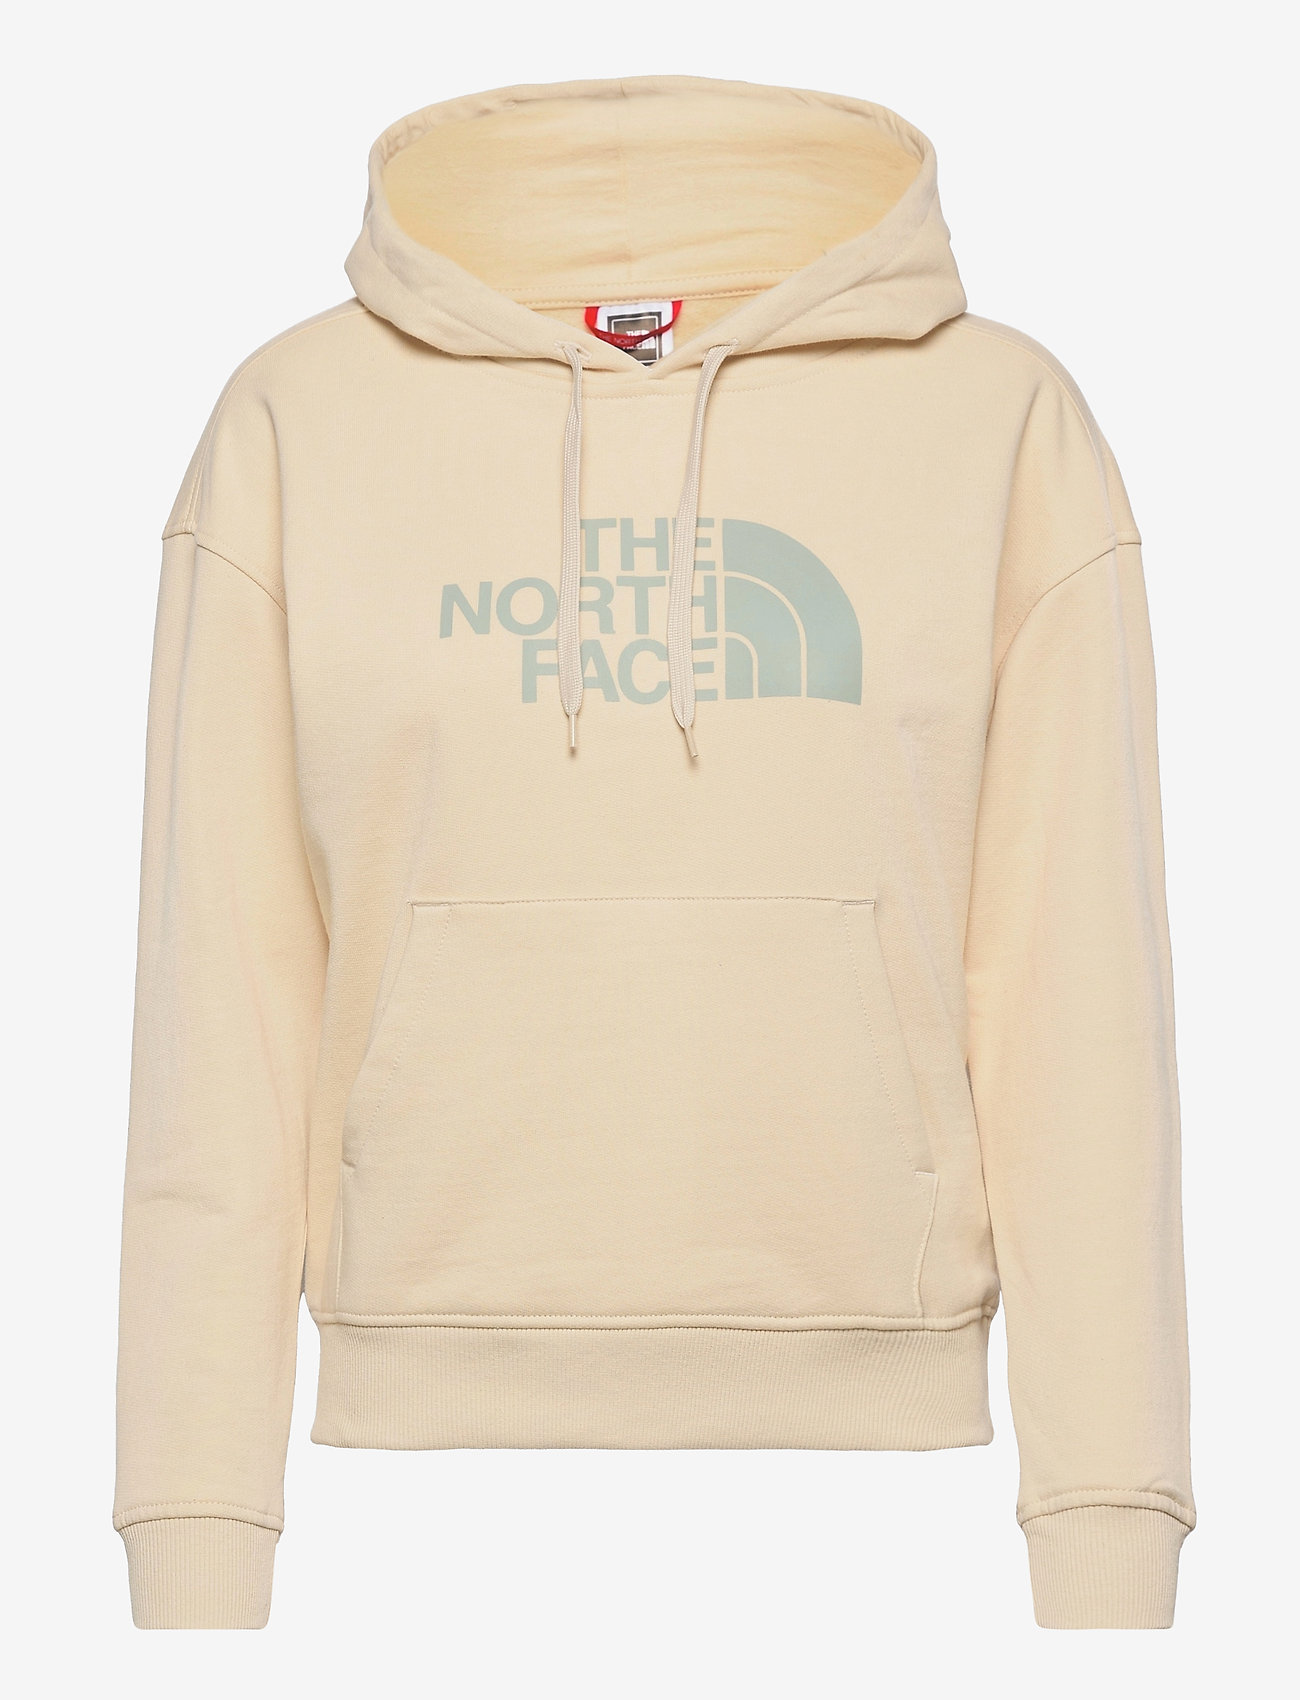 The North Face - W LHT DREW PEAK HD - hættetrøjer - bleached sand - 0